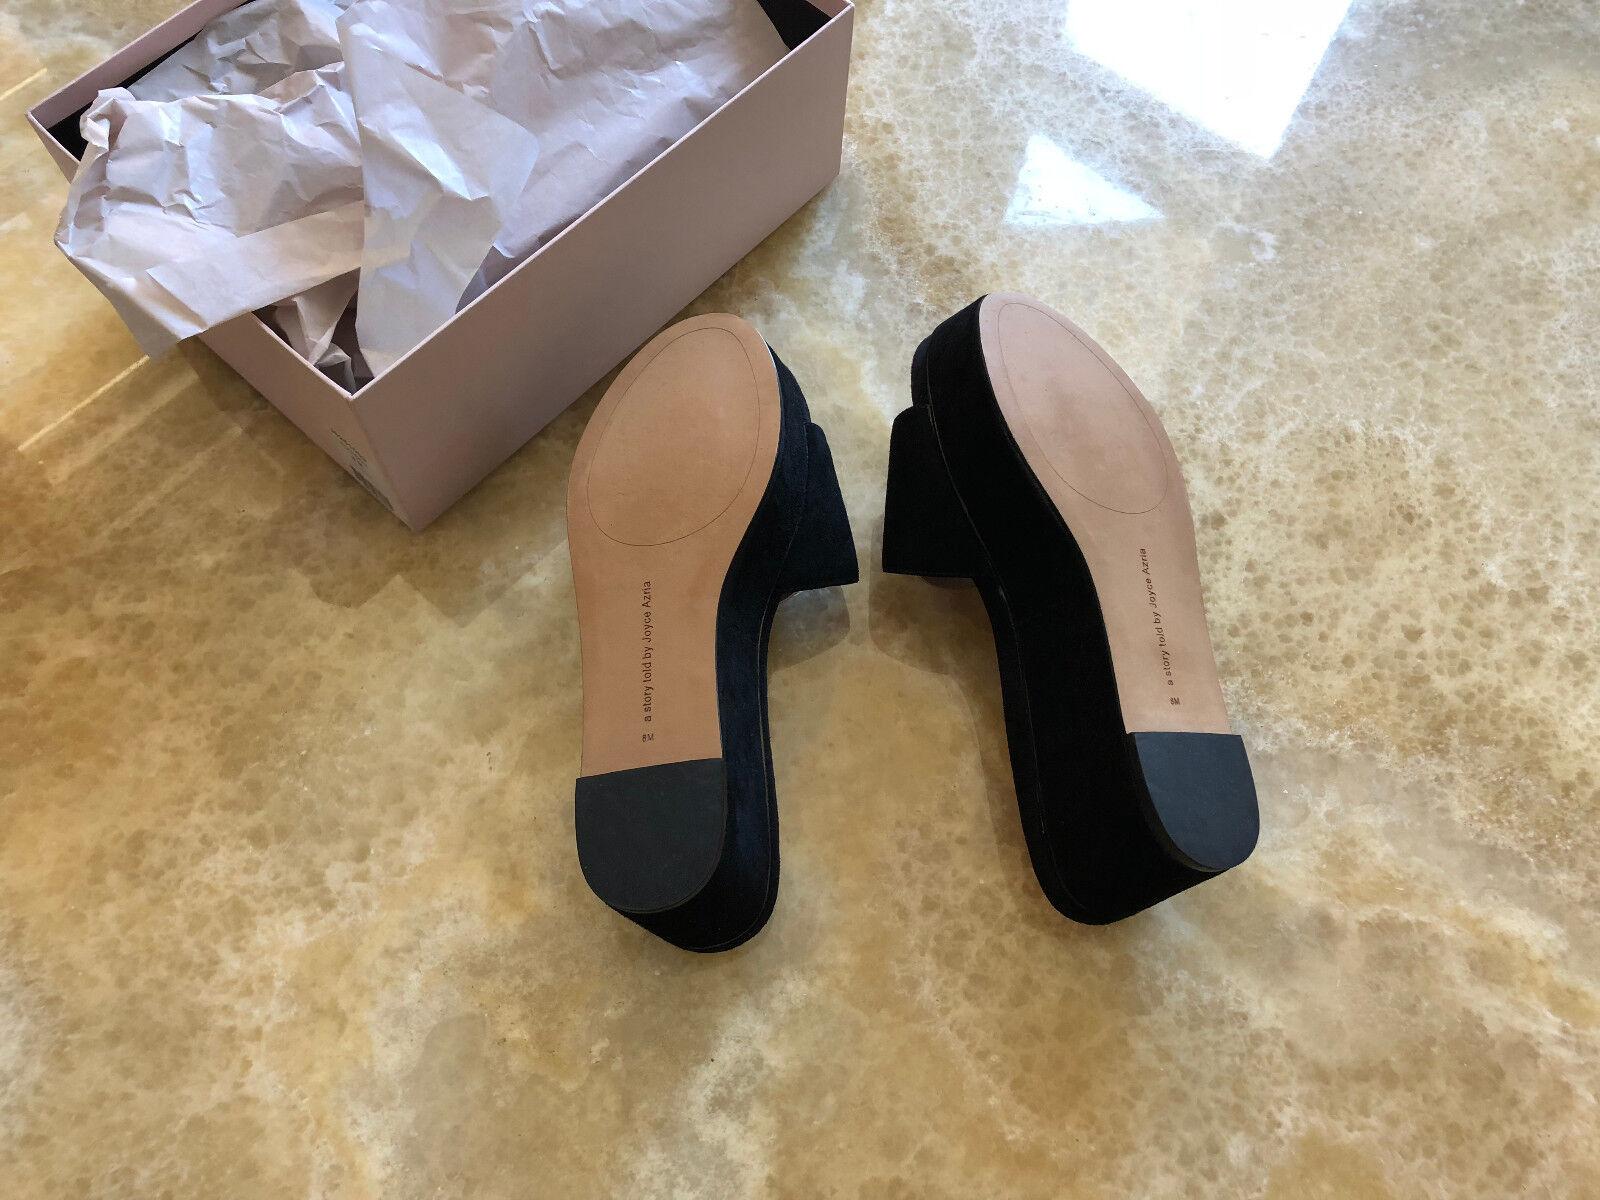 Neri in sandali, pelle scamosciata elegante Flatforms, Plateau Ciabatte zeppa sandali, in 55b424